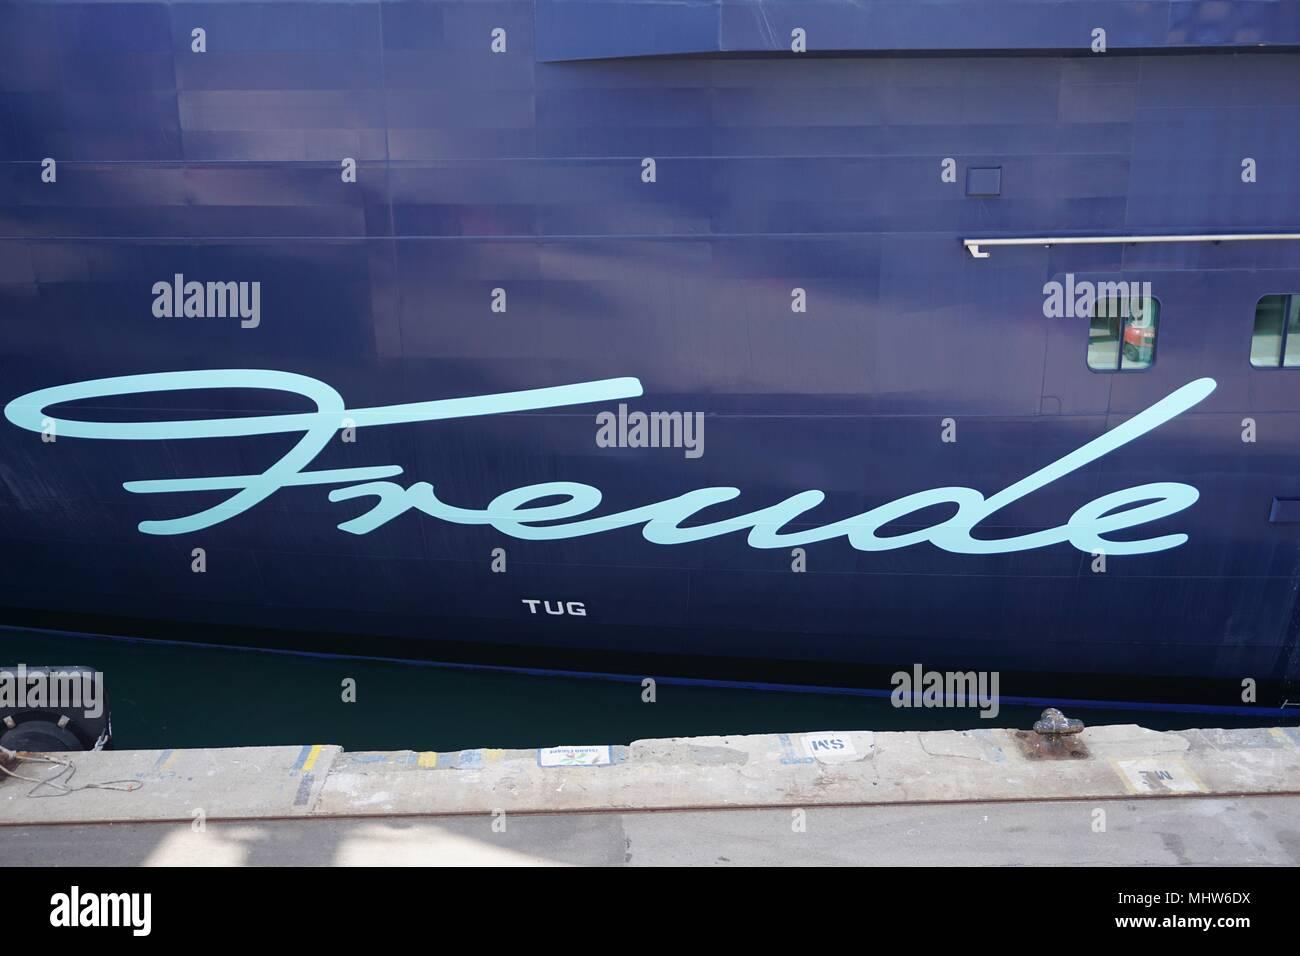 cruise ship Mein Schiff 6 TUI cruises - Stock Image